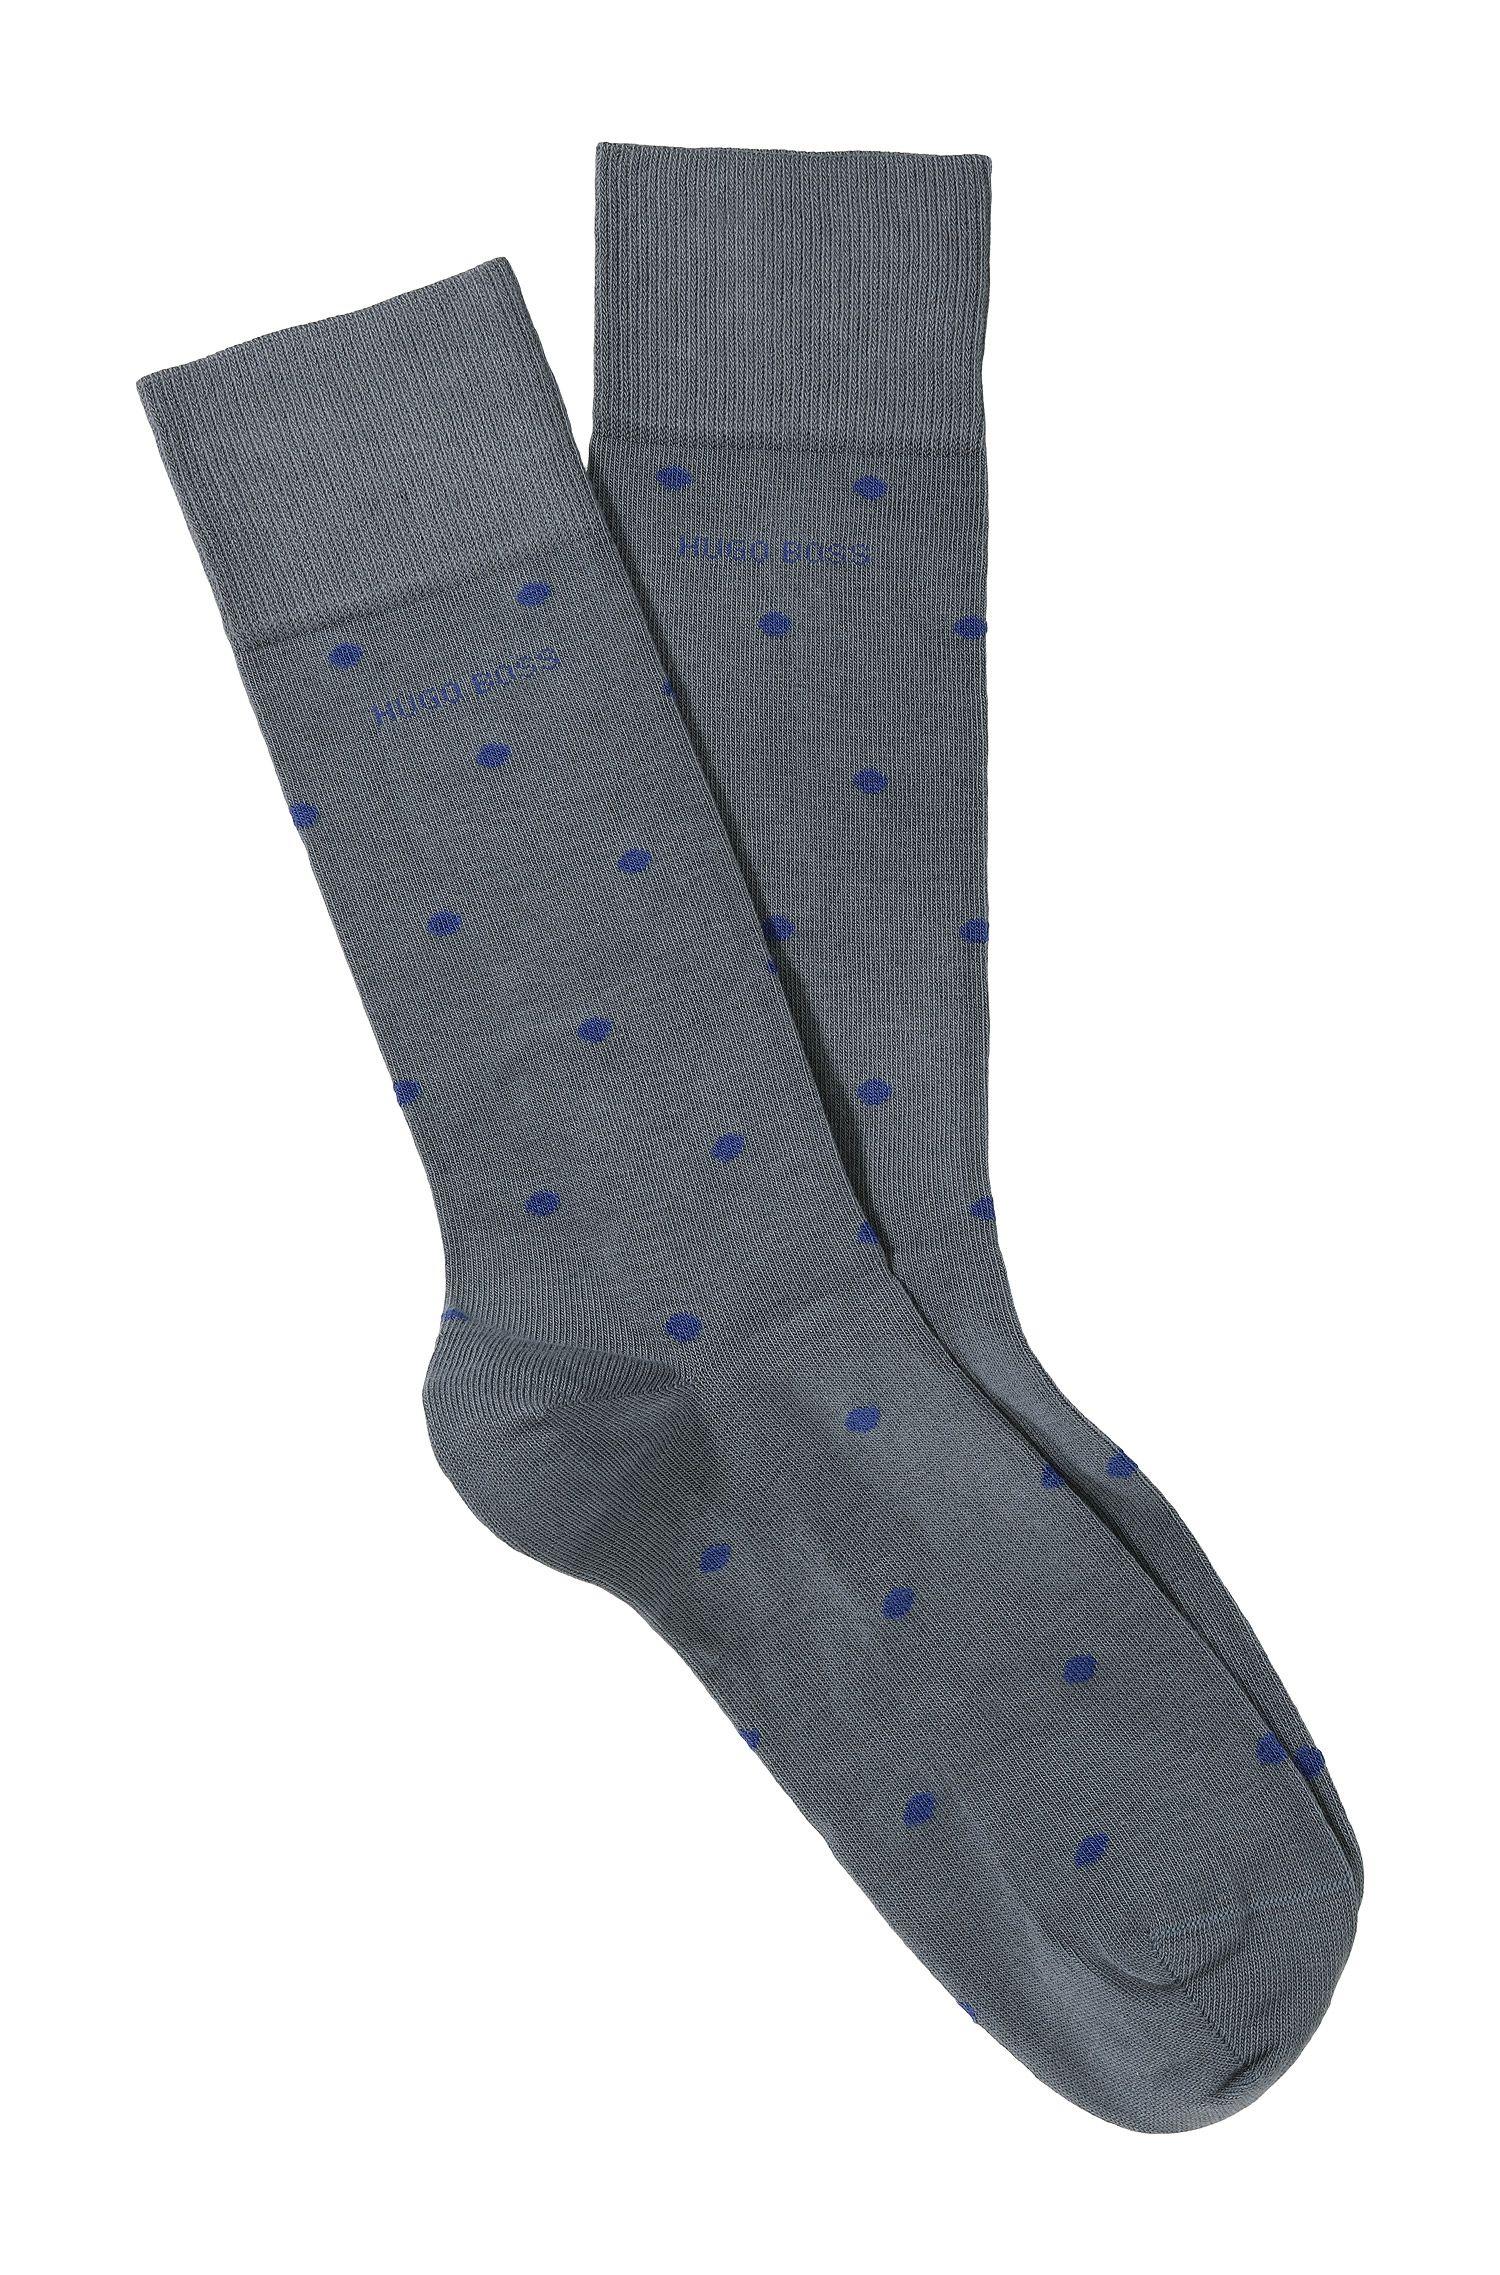 Socken ´RS Design` aus Baumwollkomposition, Dunkelgrau